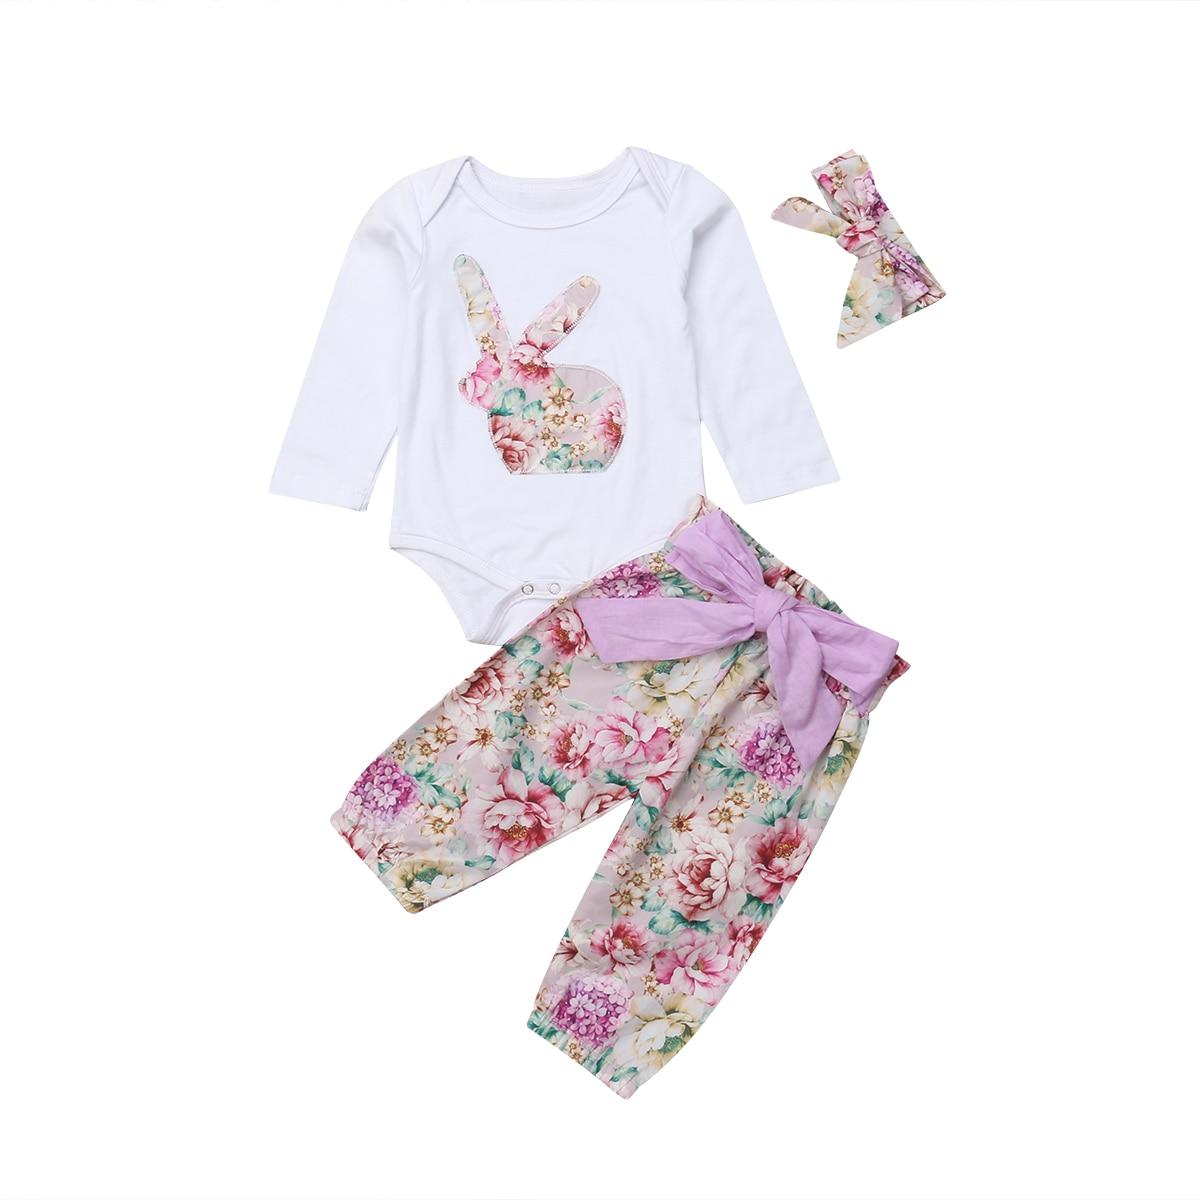 Newborn Infant Baby Girl Clothes Jumpsuit Romper Bodysuit Headband Outfits Set